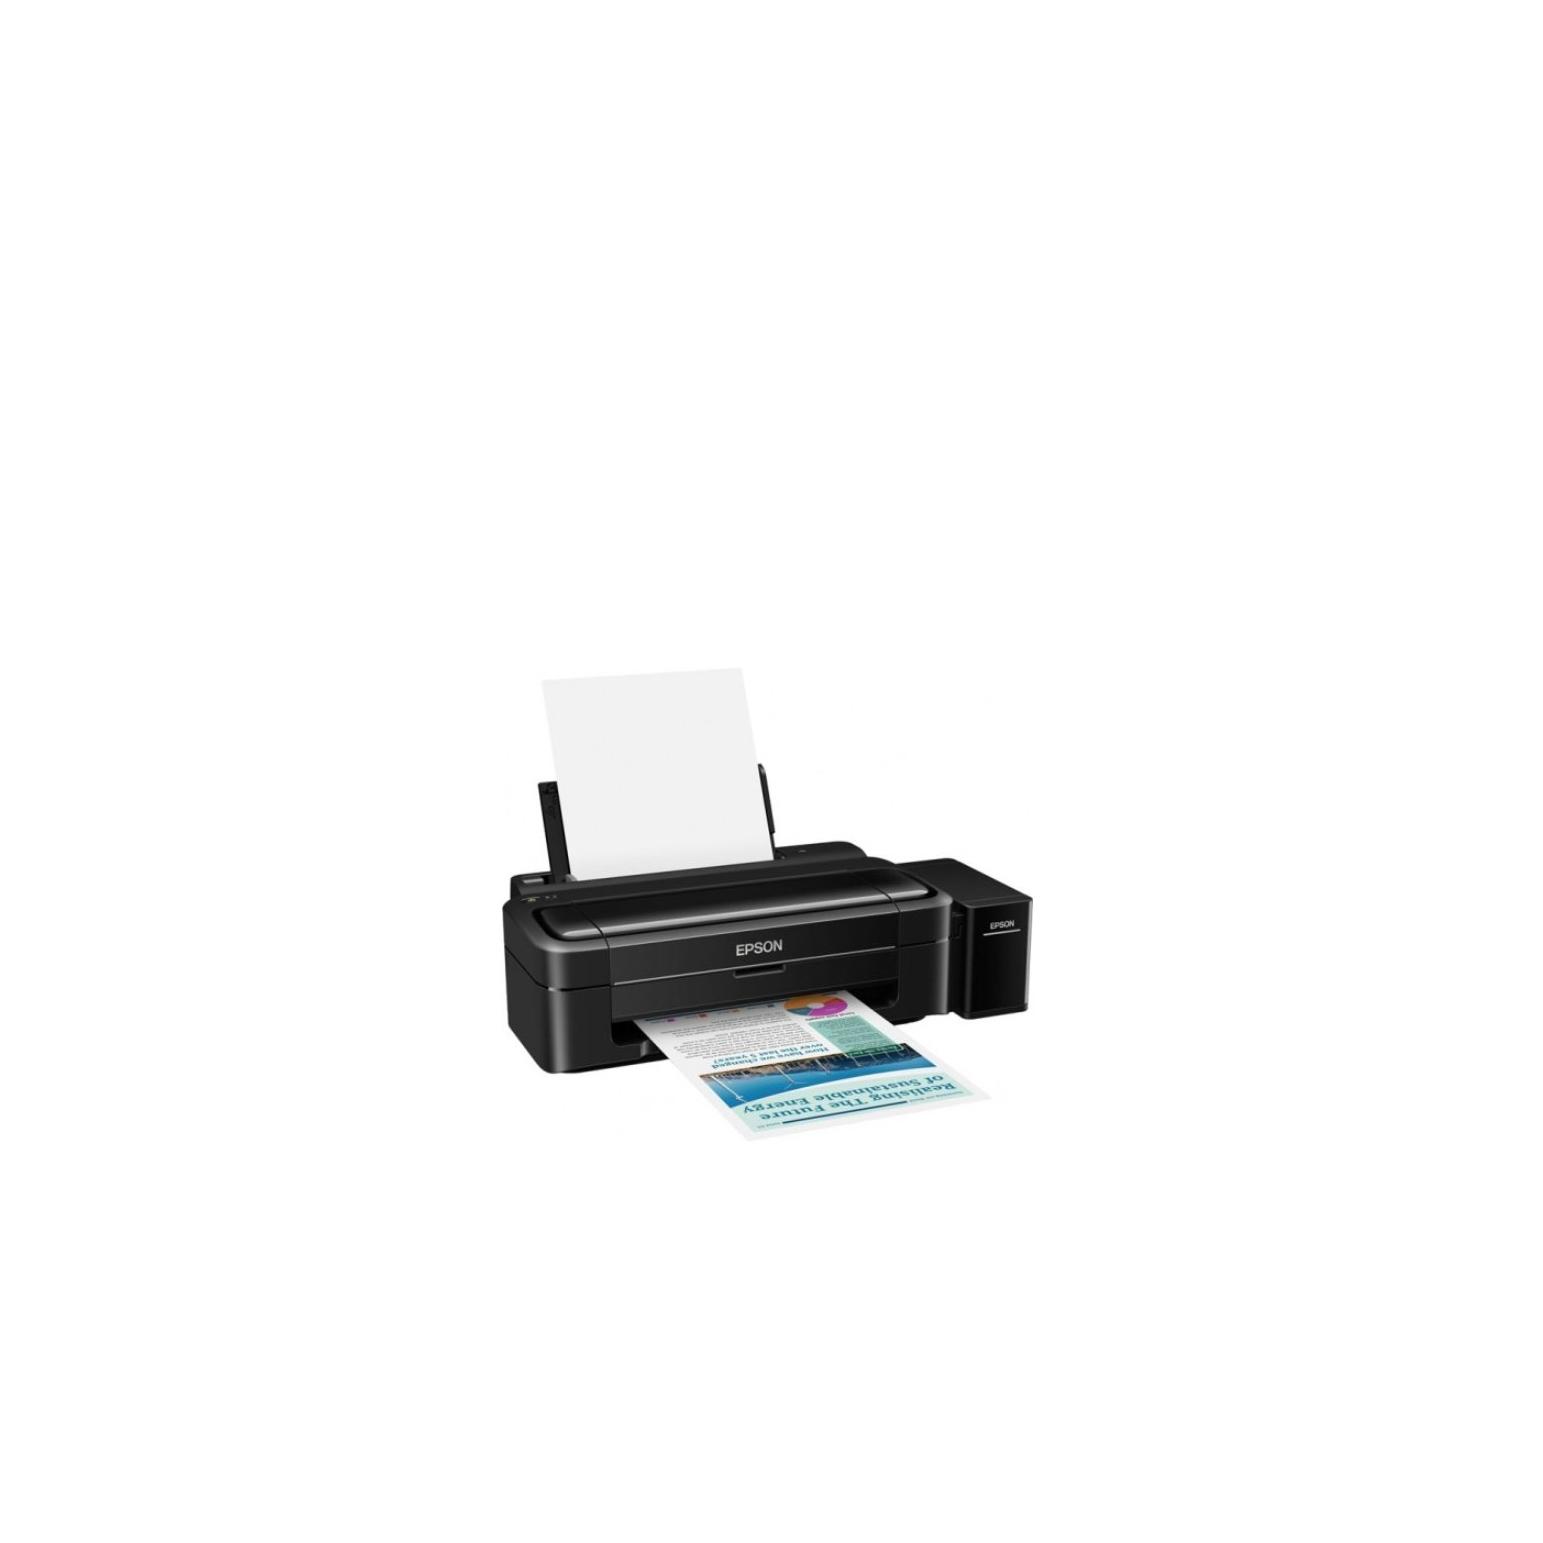 Принтер Epson L312 Color C11CE57403